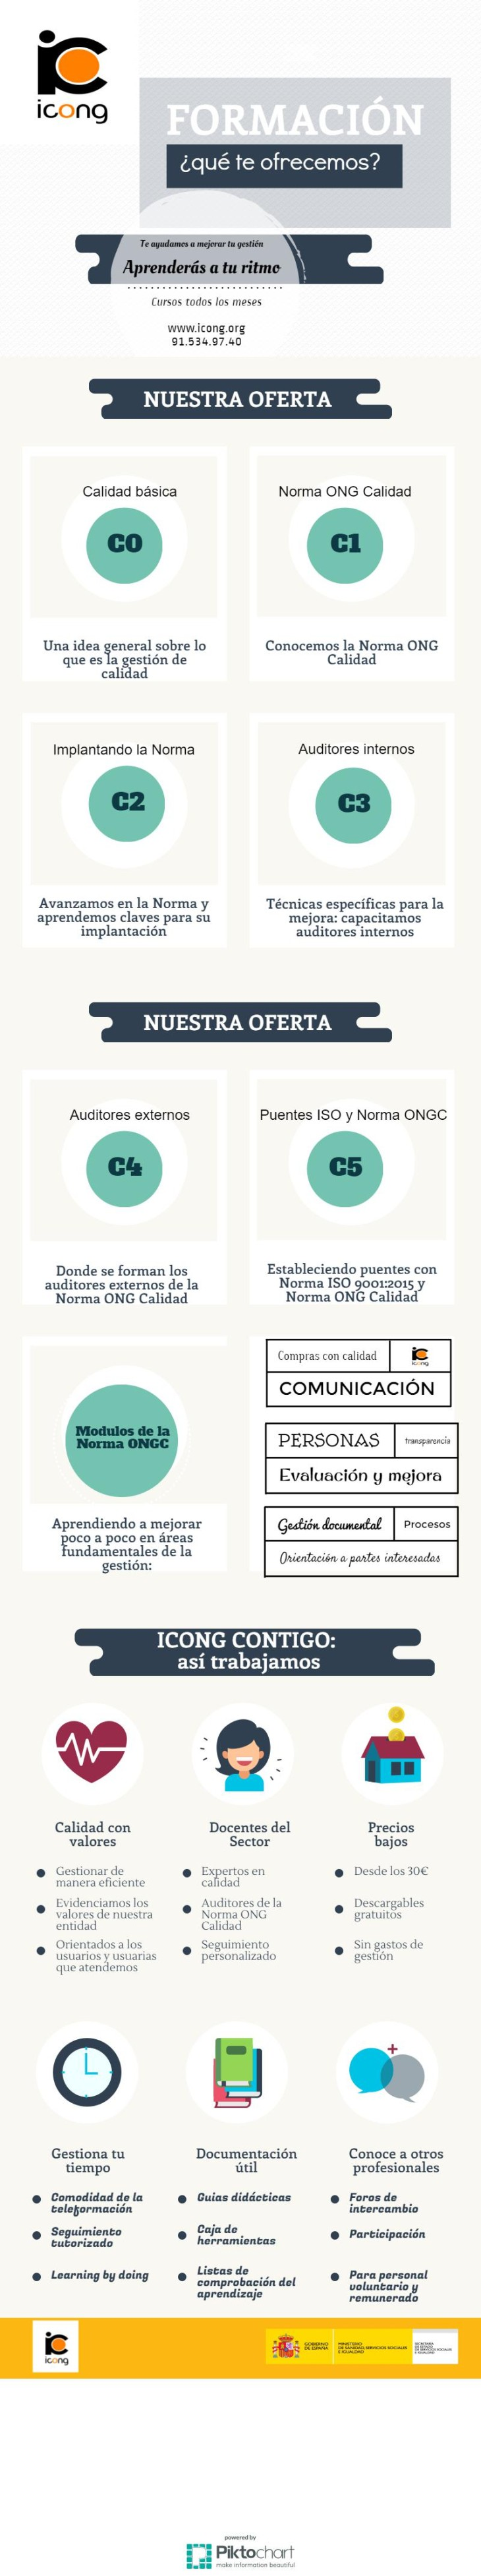 infografia-formacion-icong